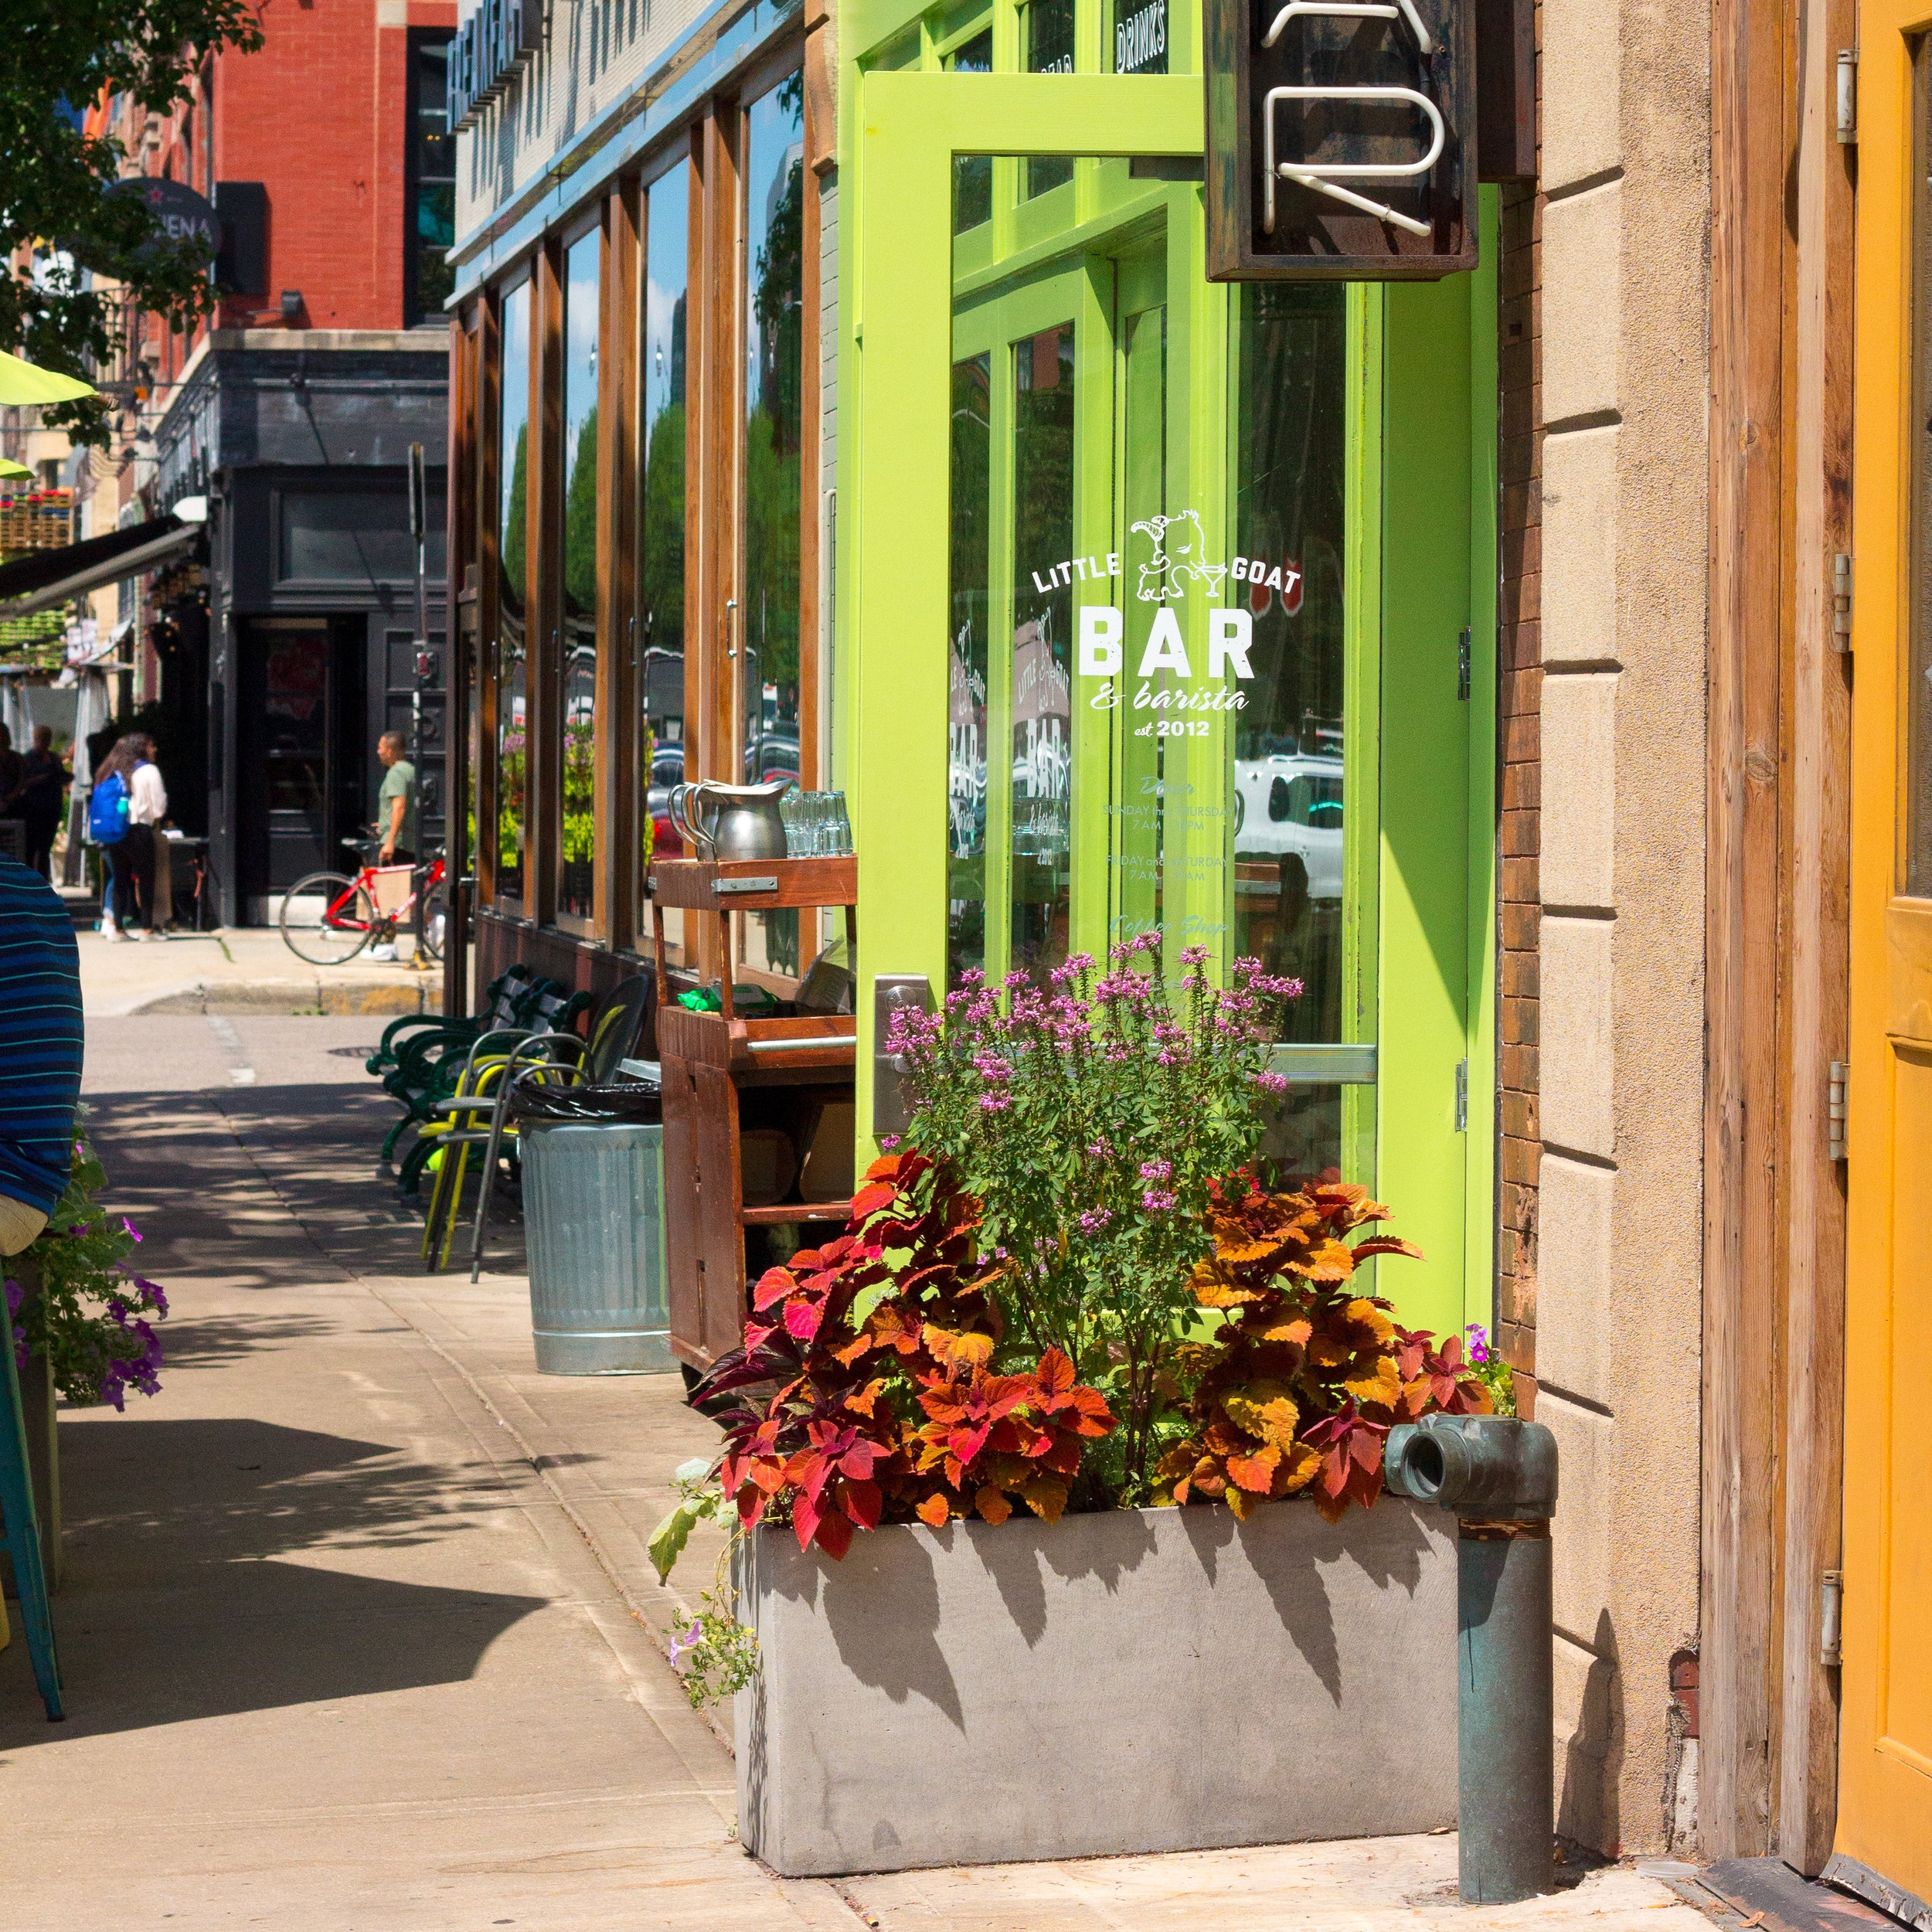 Design by CWL for Little Goat Diner: 820 W. Randolph St.